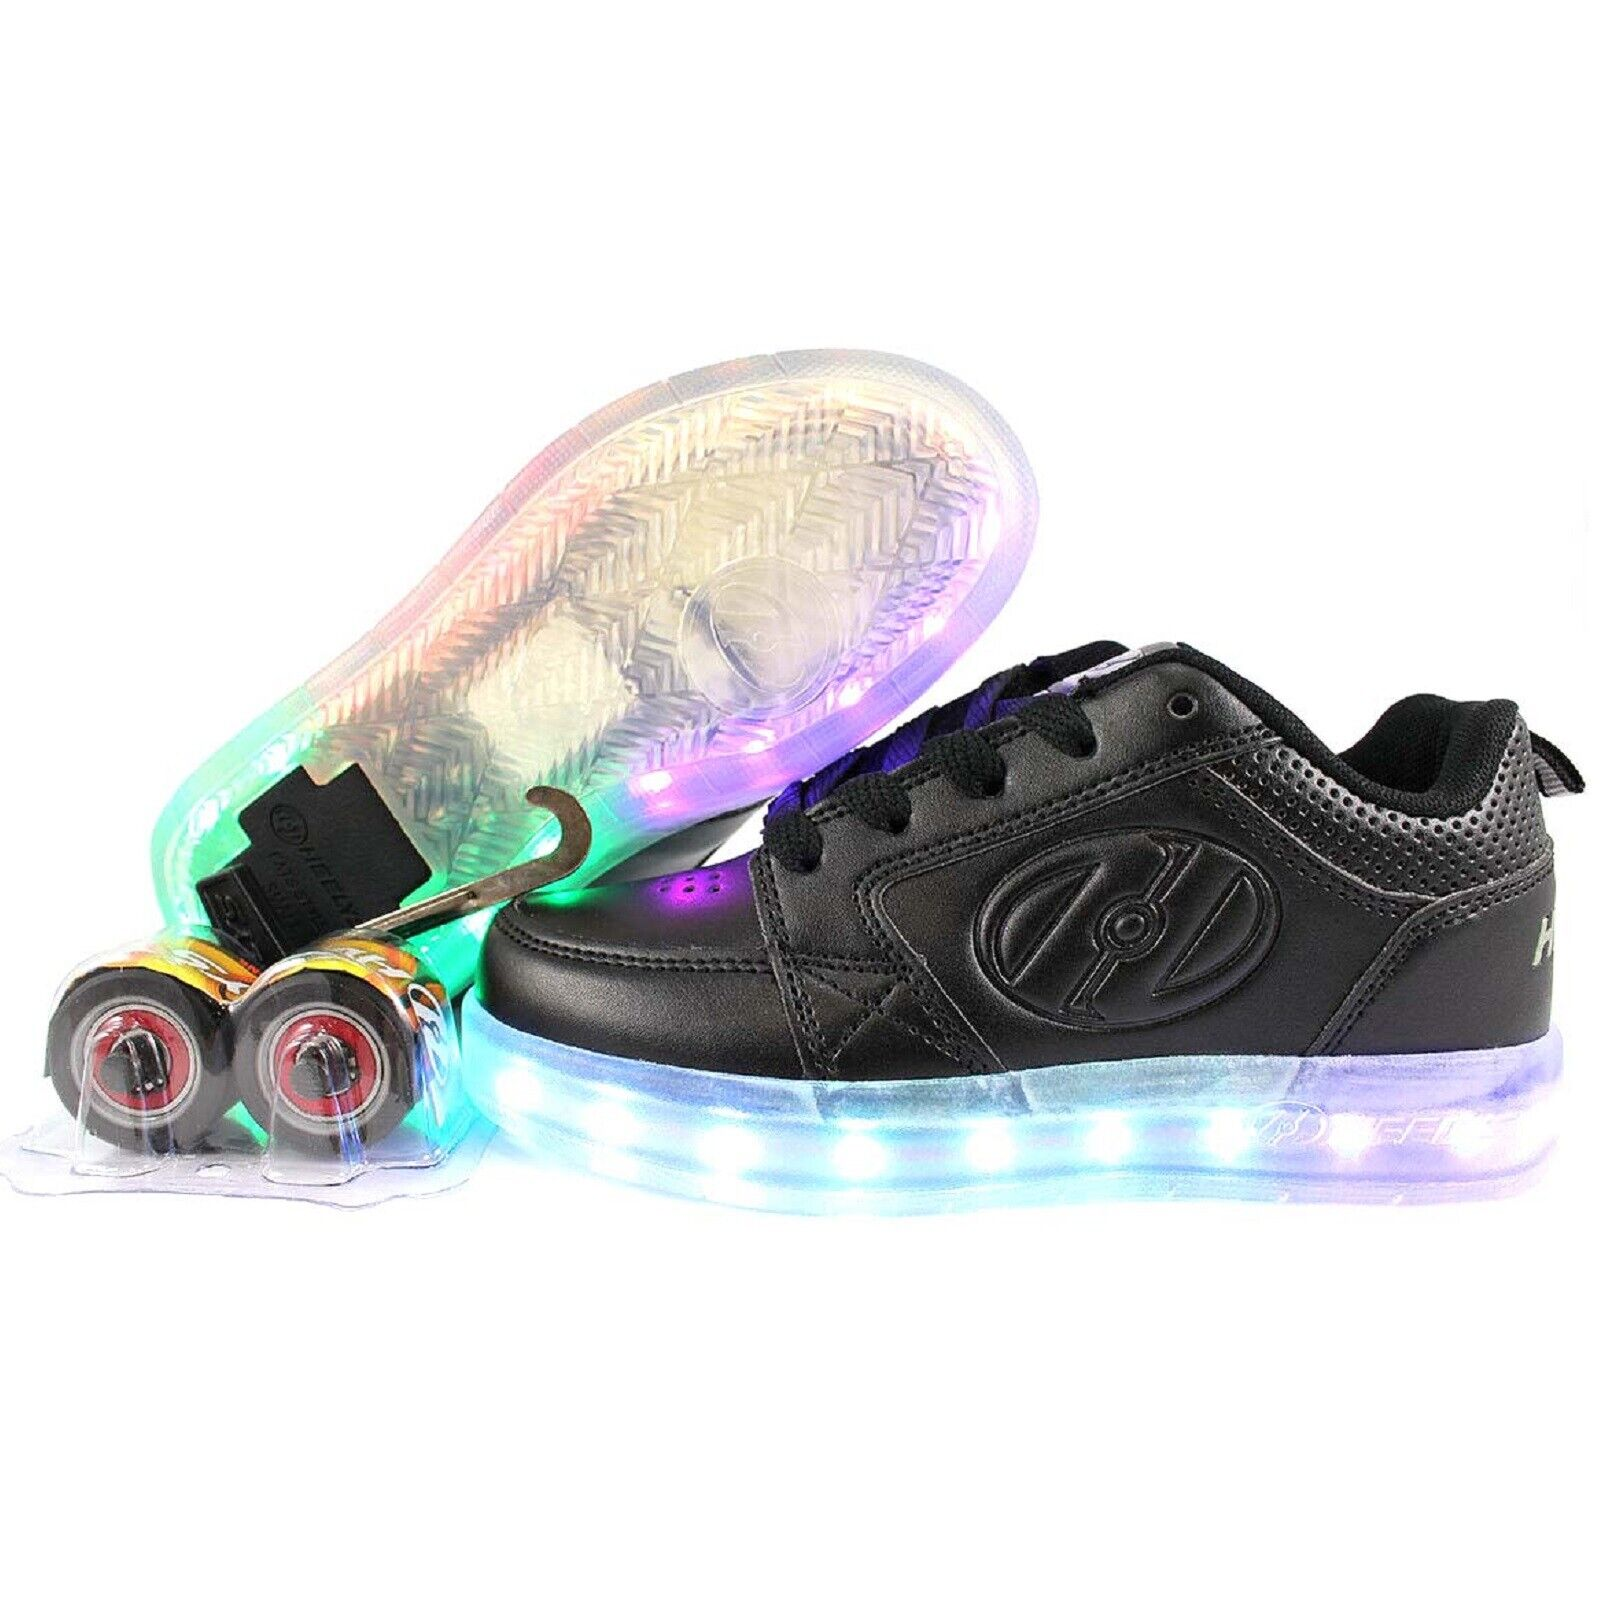 Triple White RRP £49.99 Heelys Premium 1 Lo Light Up Shoes